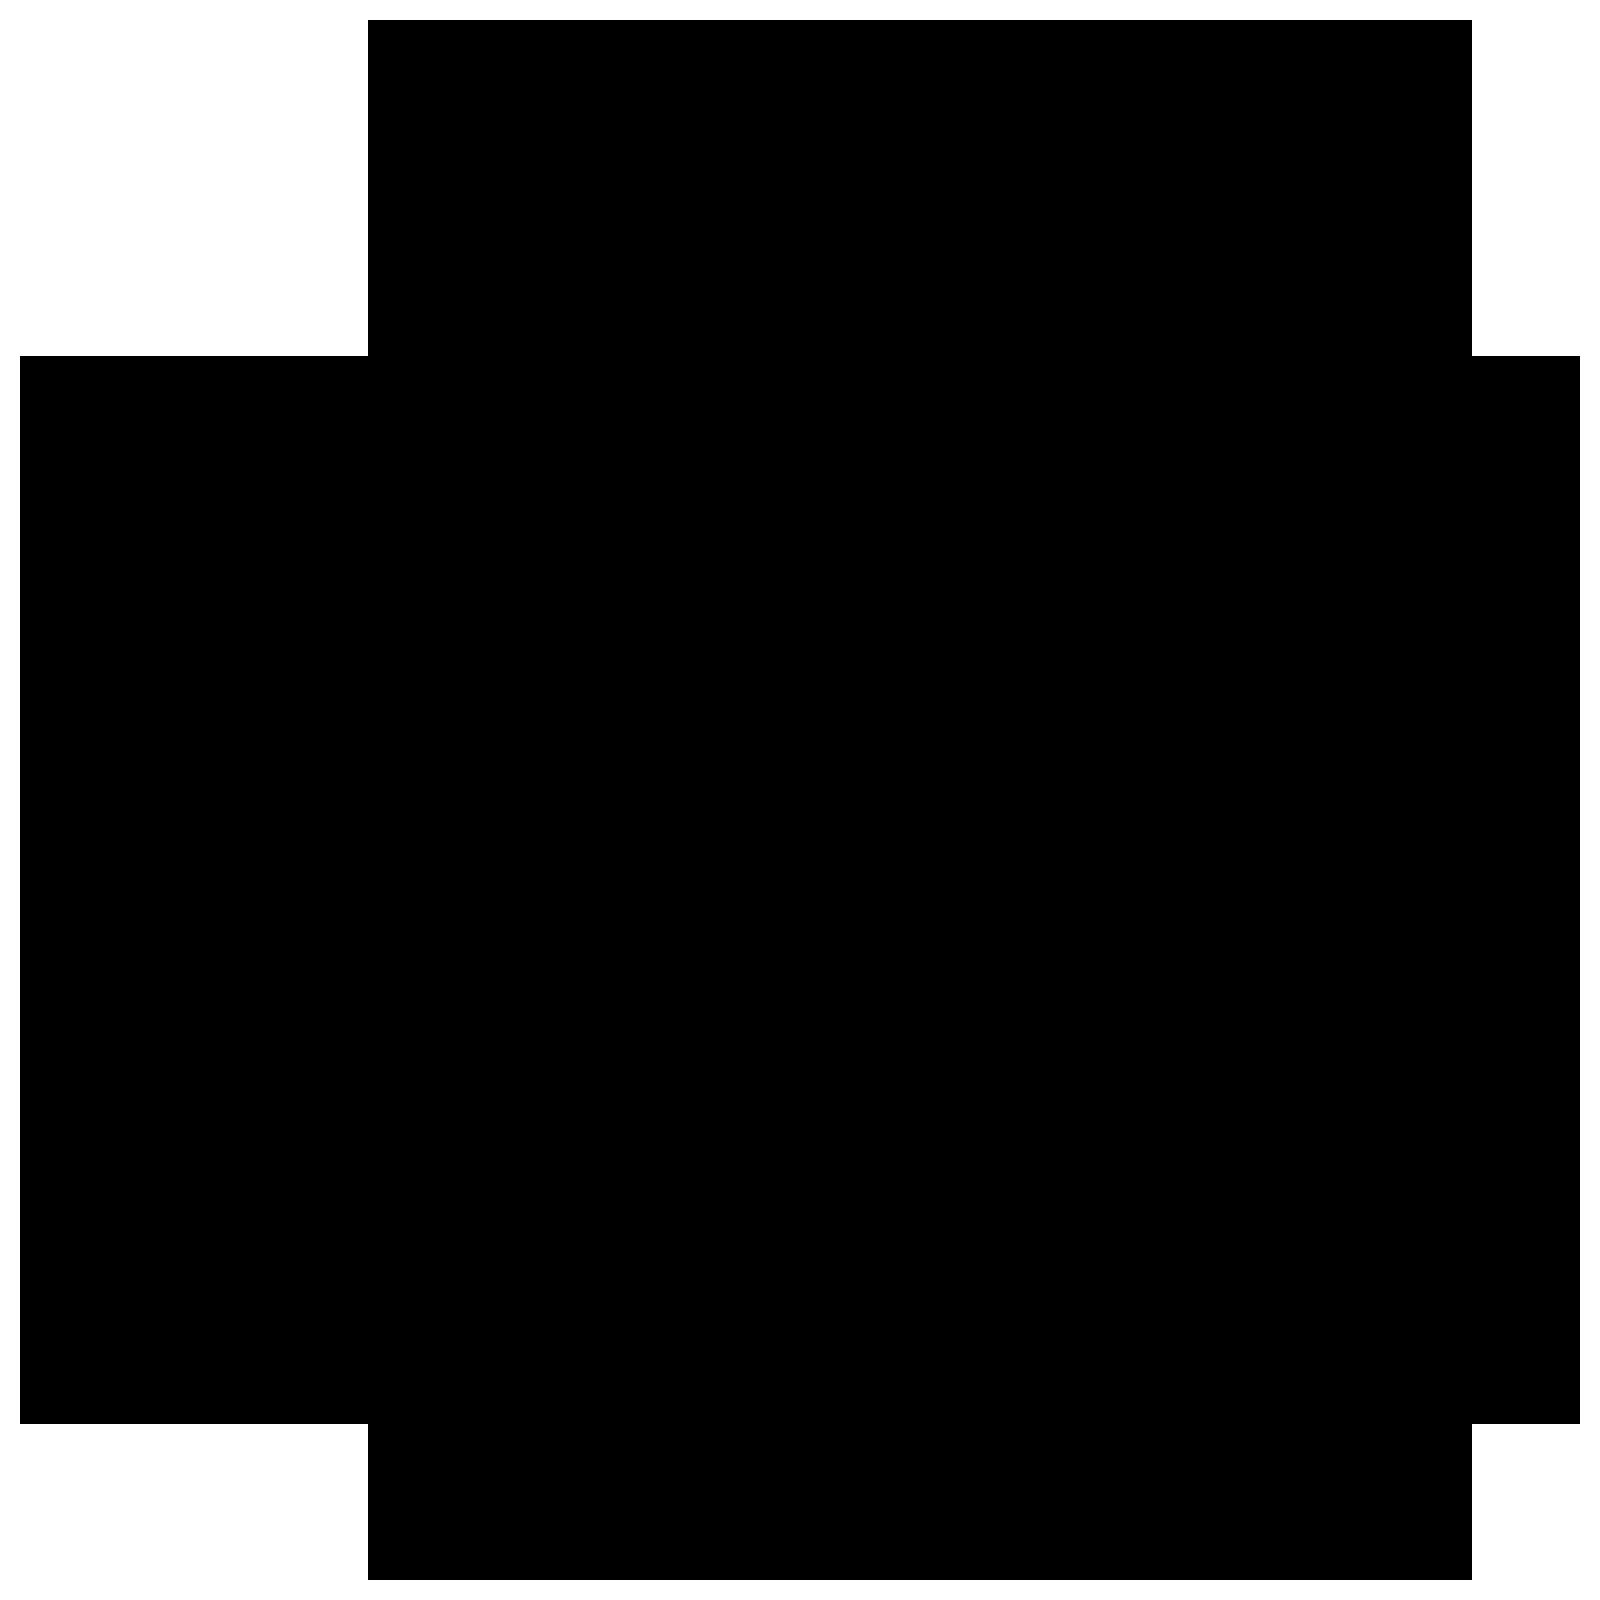 A black icon of Slack's logo